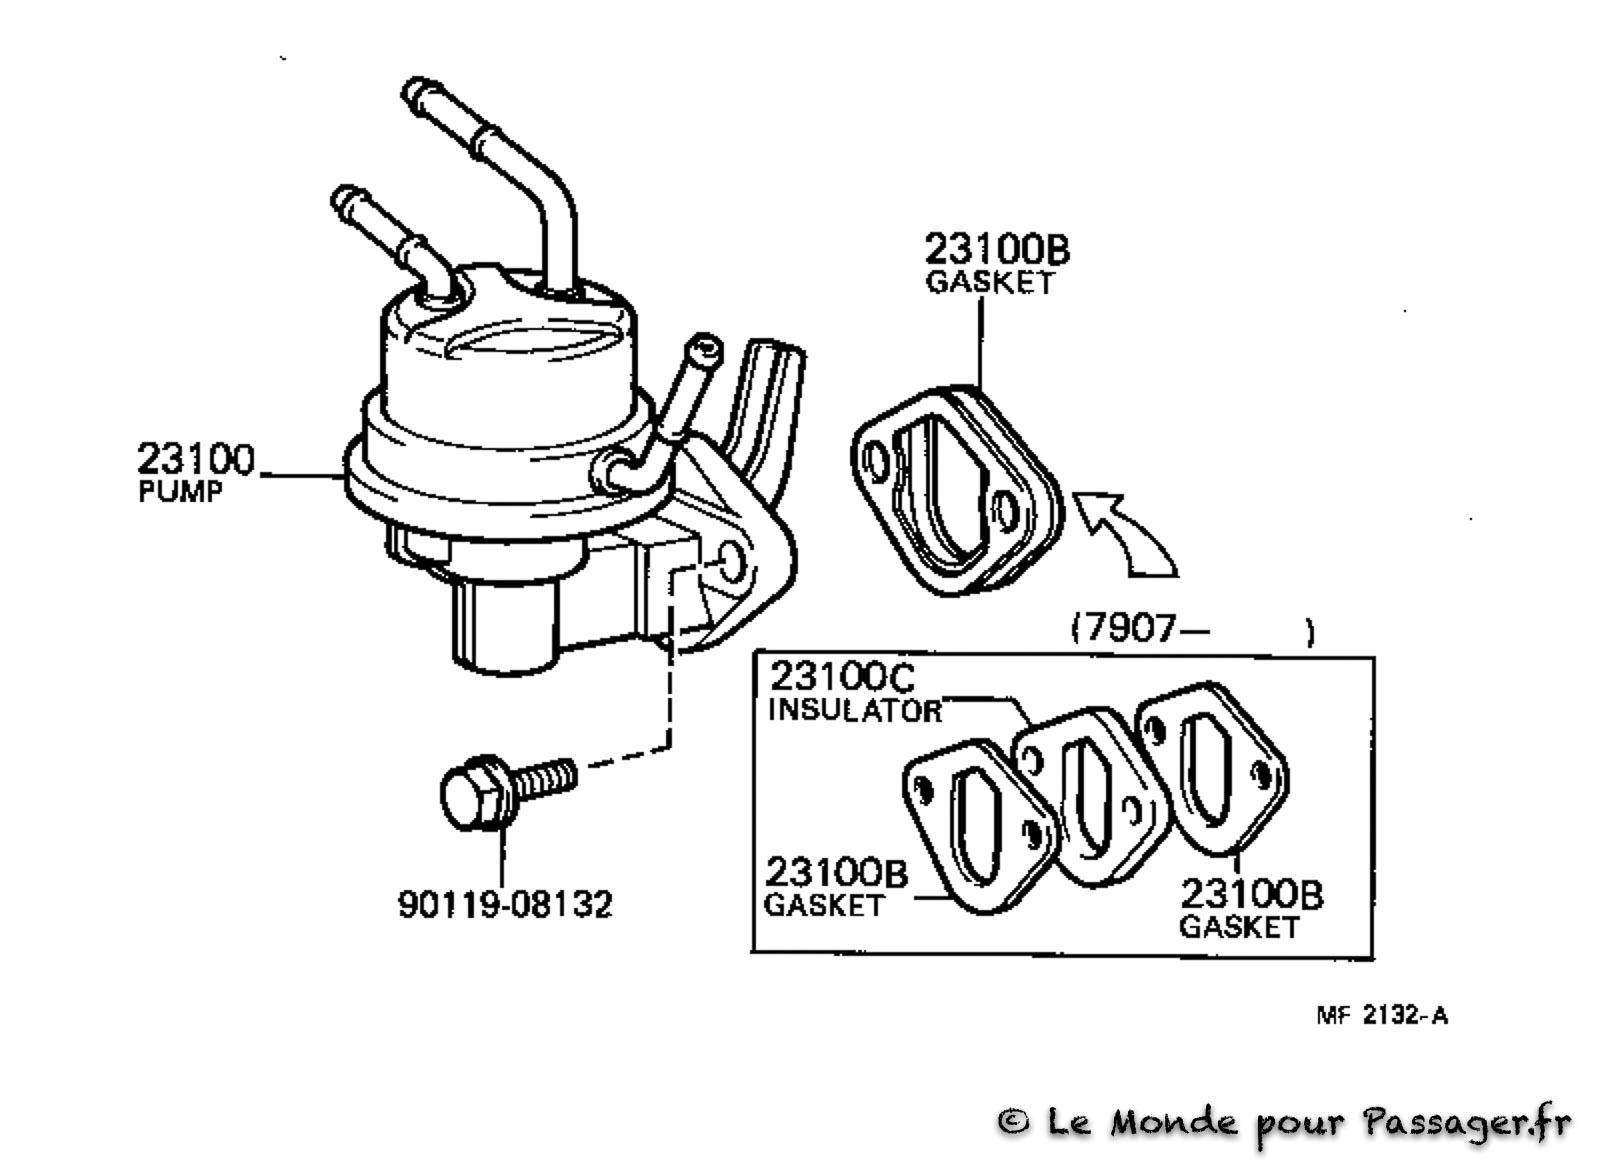 Fj55-Eclatés-Techniques001